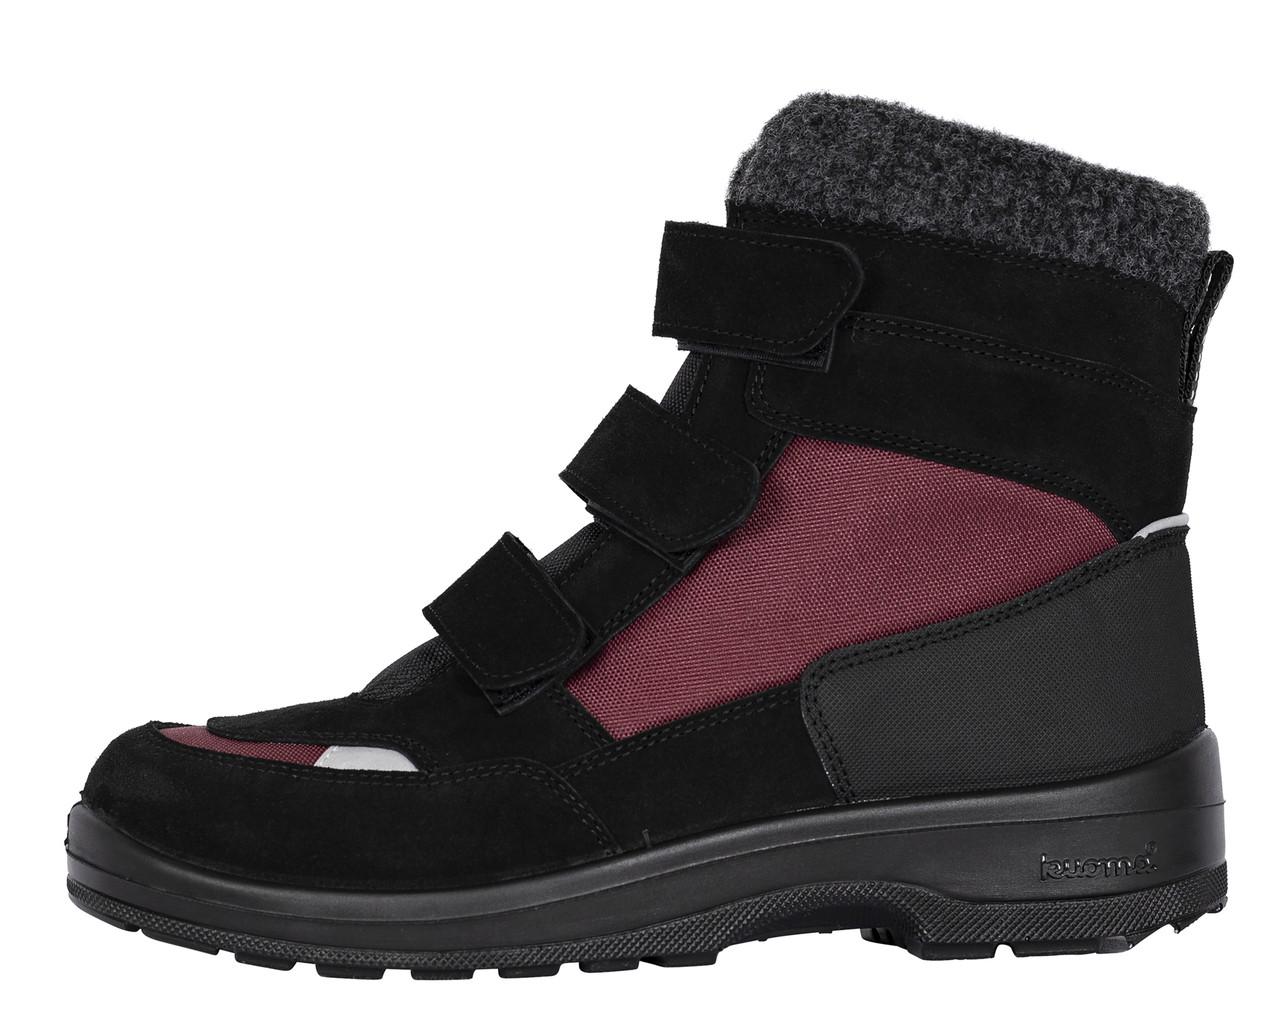 Обувь взрослая Kuoma Tarra Tuisku, Black/Black